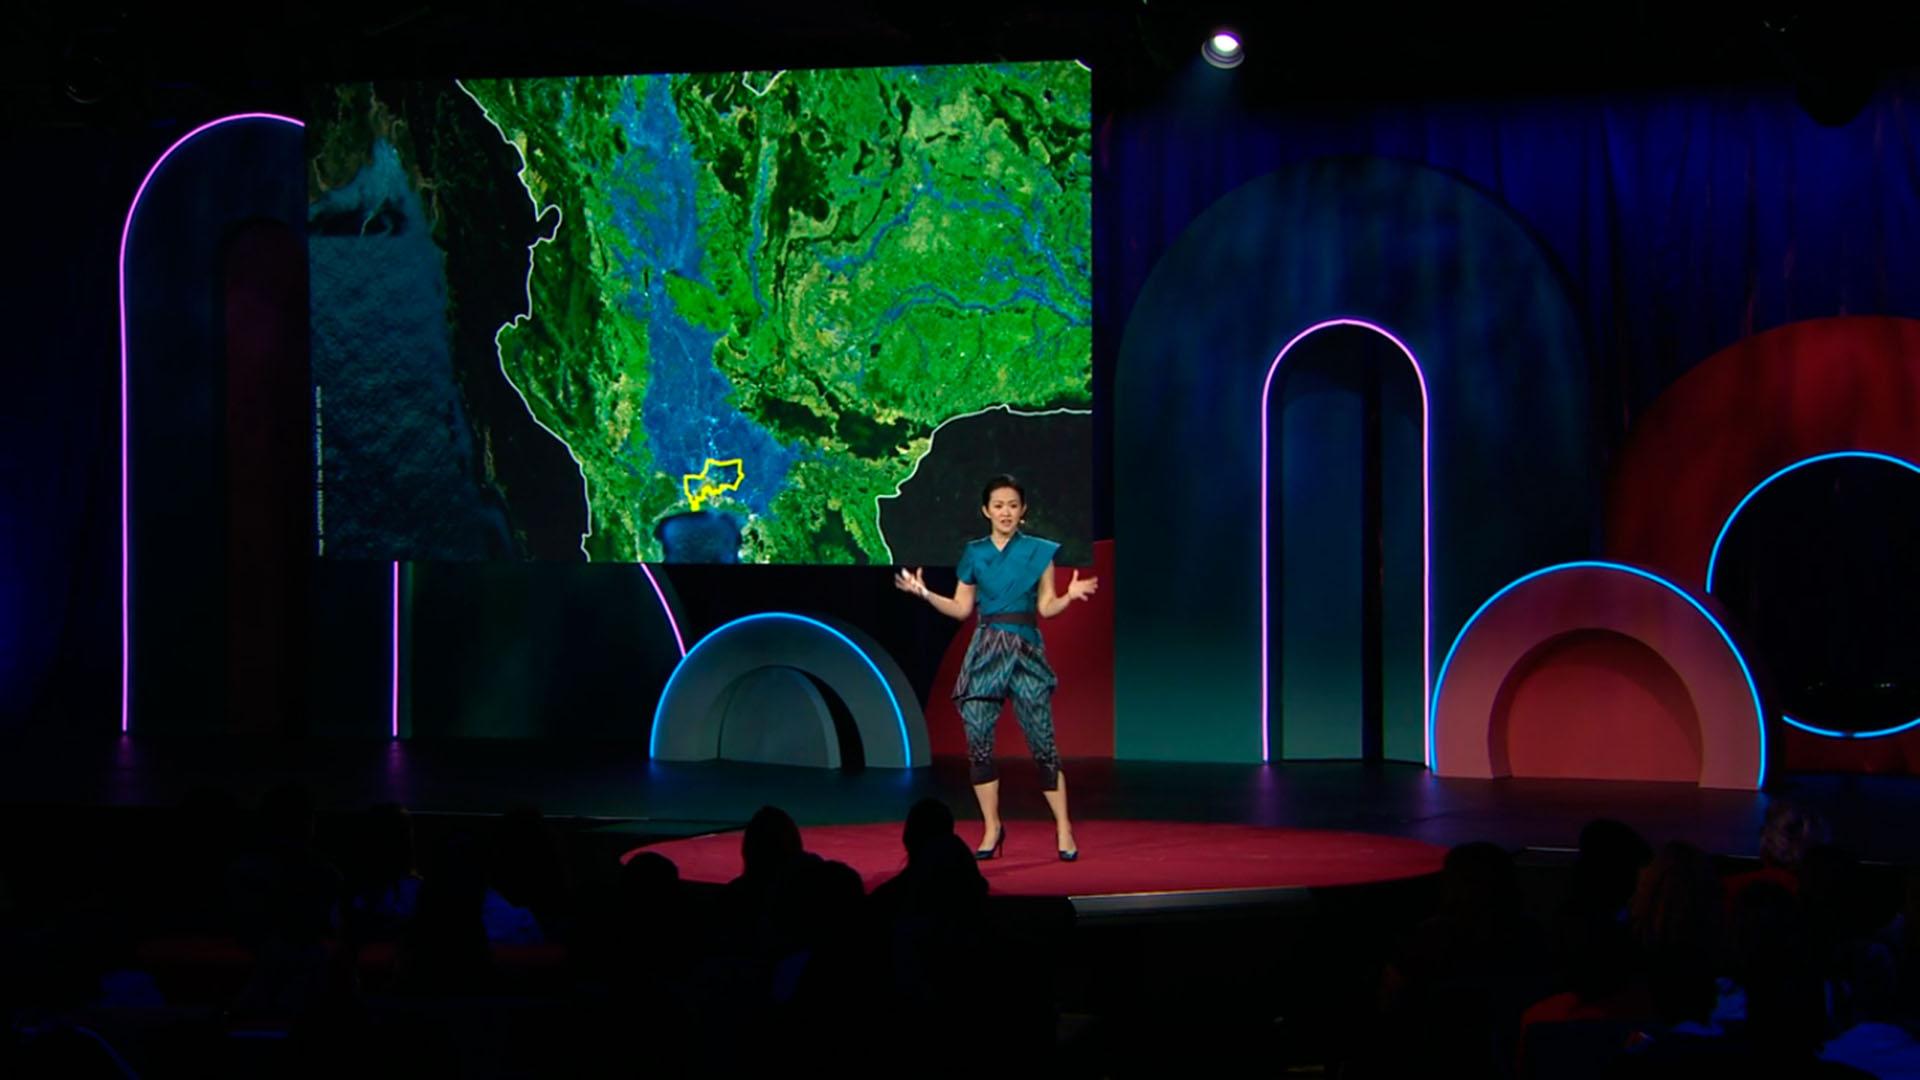 TED Talk con Kotchakorn Voraakhom